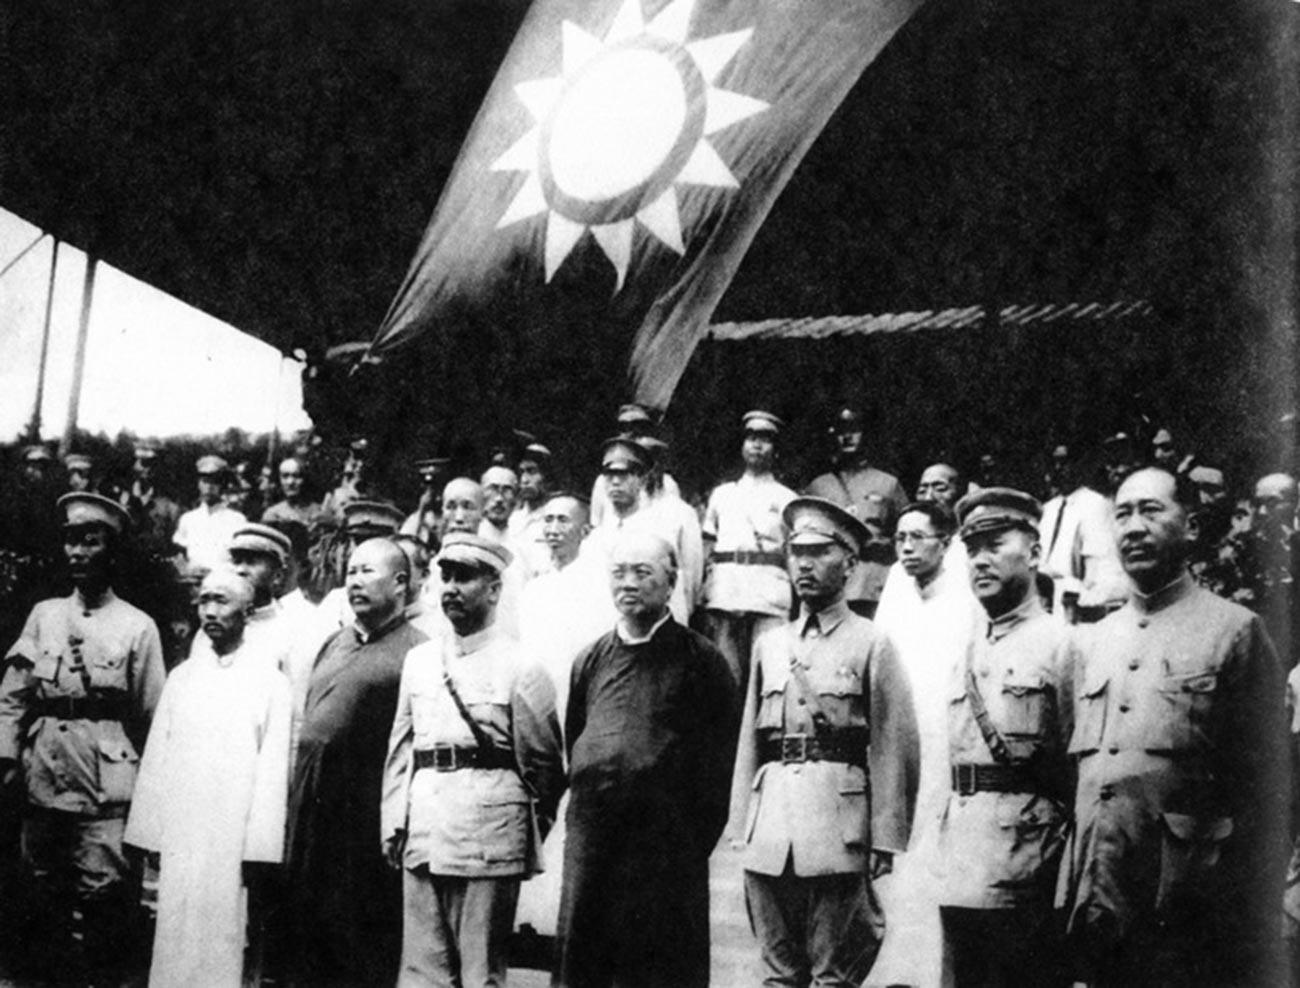 Die Generäle der Nationalen Revolutionsarmee der Kuomintang